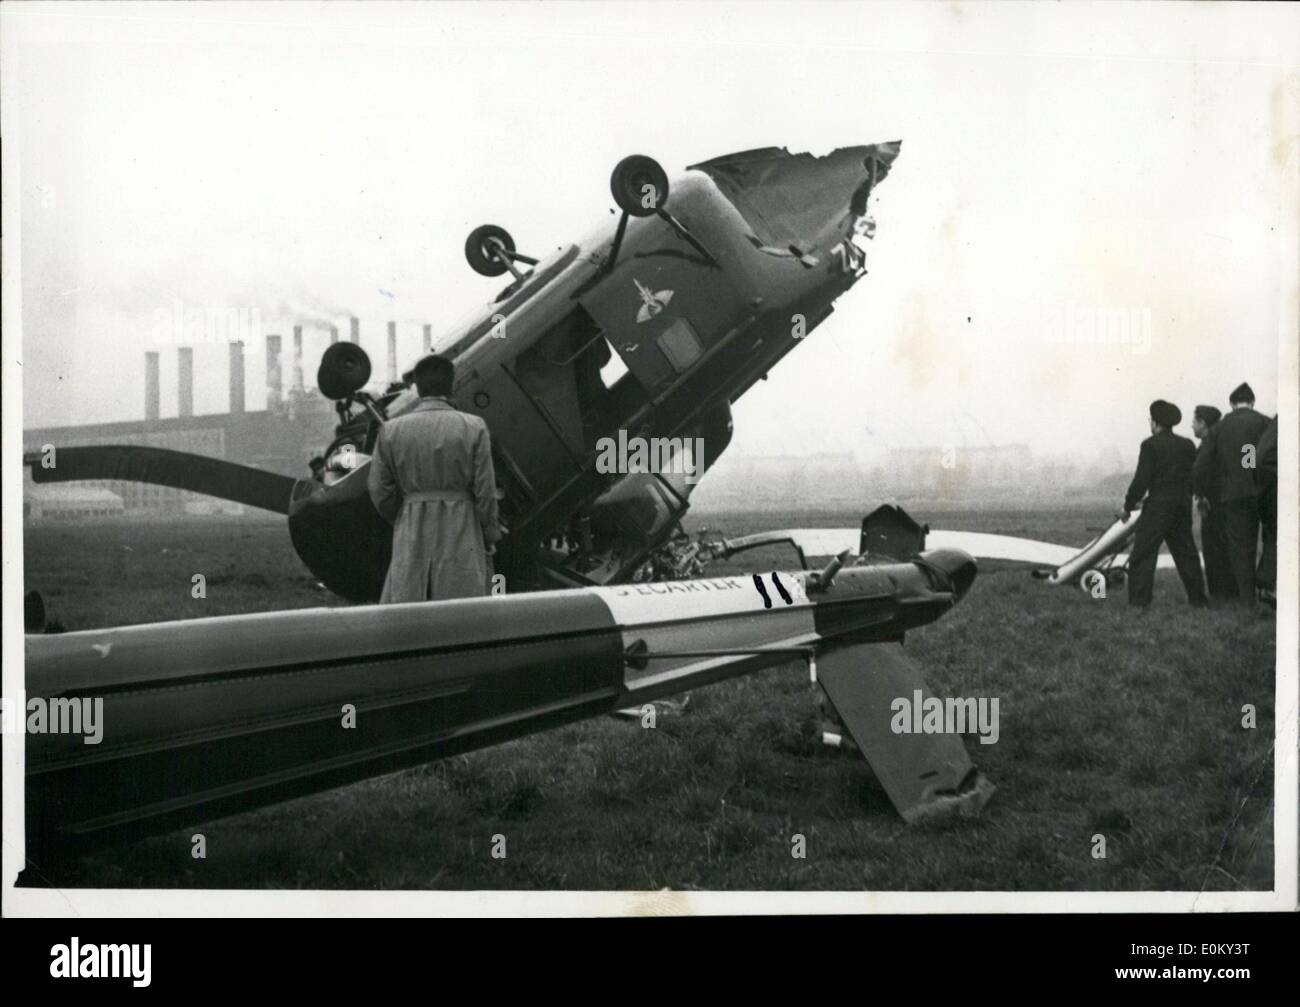 Elicottero S 55 : Nov crash of a sikorsky s helicopter